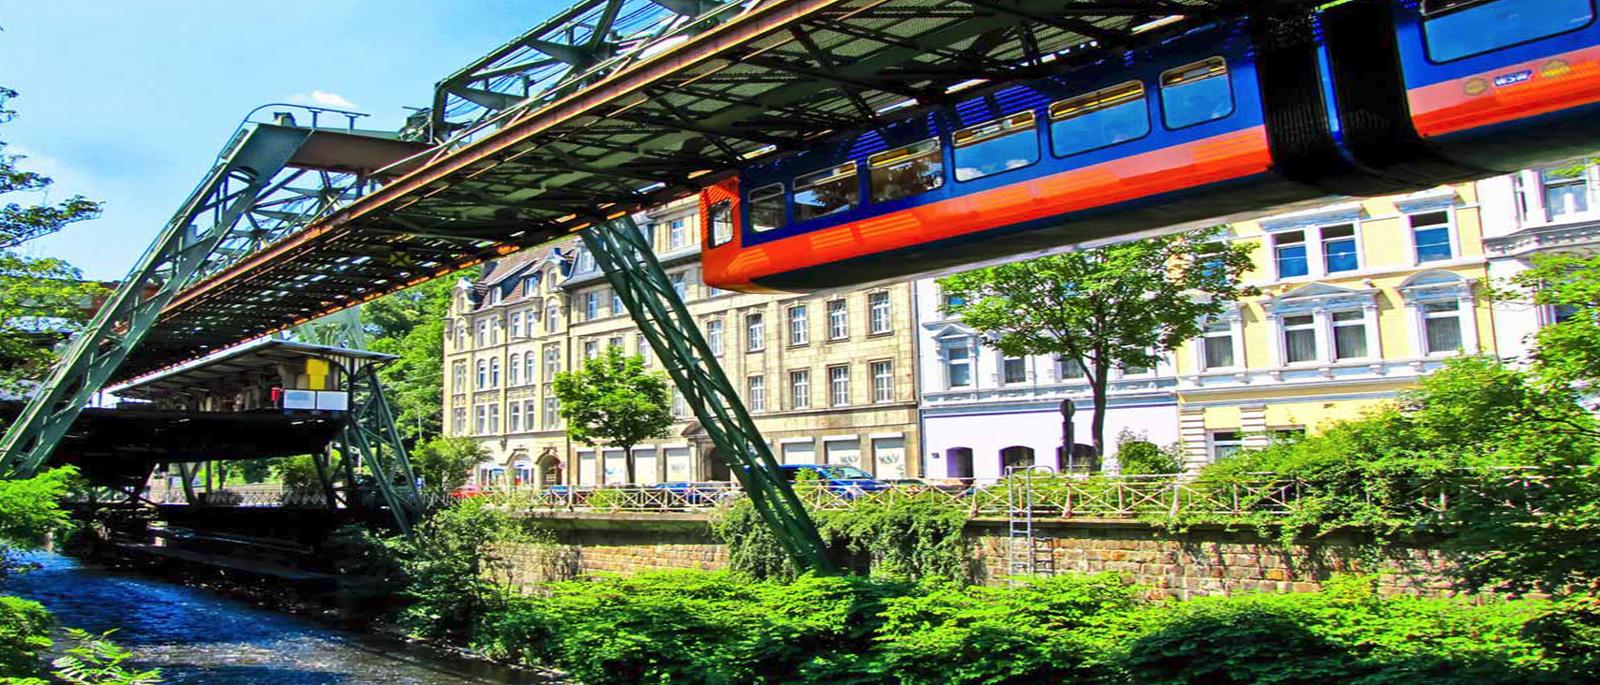 Alle Casinos in Wuppertal